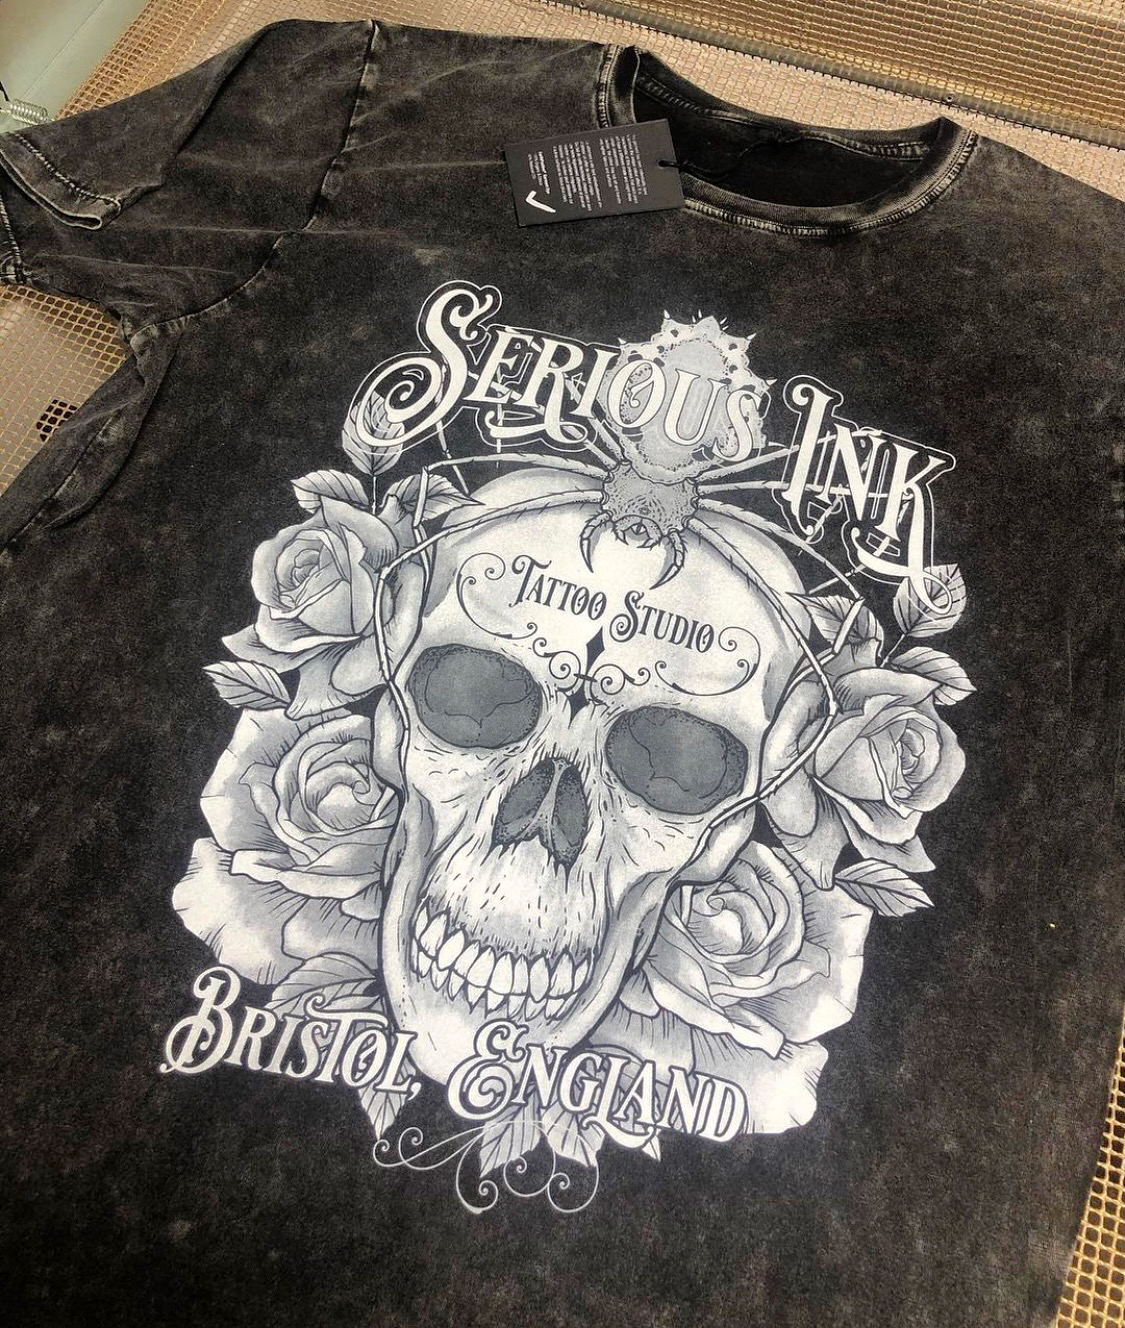 Serious Ink Tattoo Studio